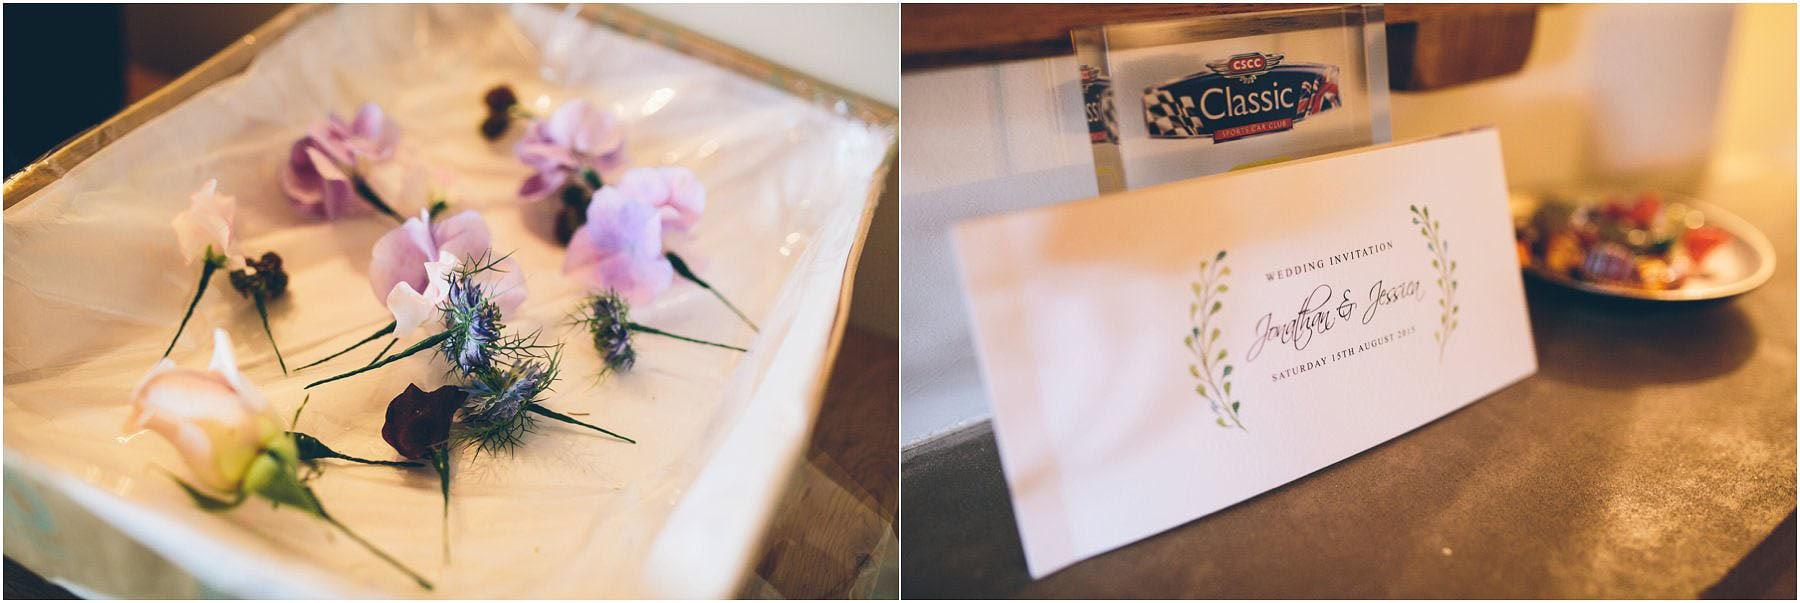 Stoneygate_Holiday_Centre_Wedding_Photography_0012